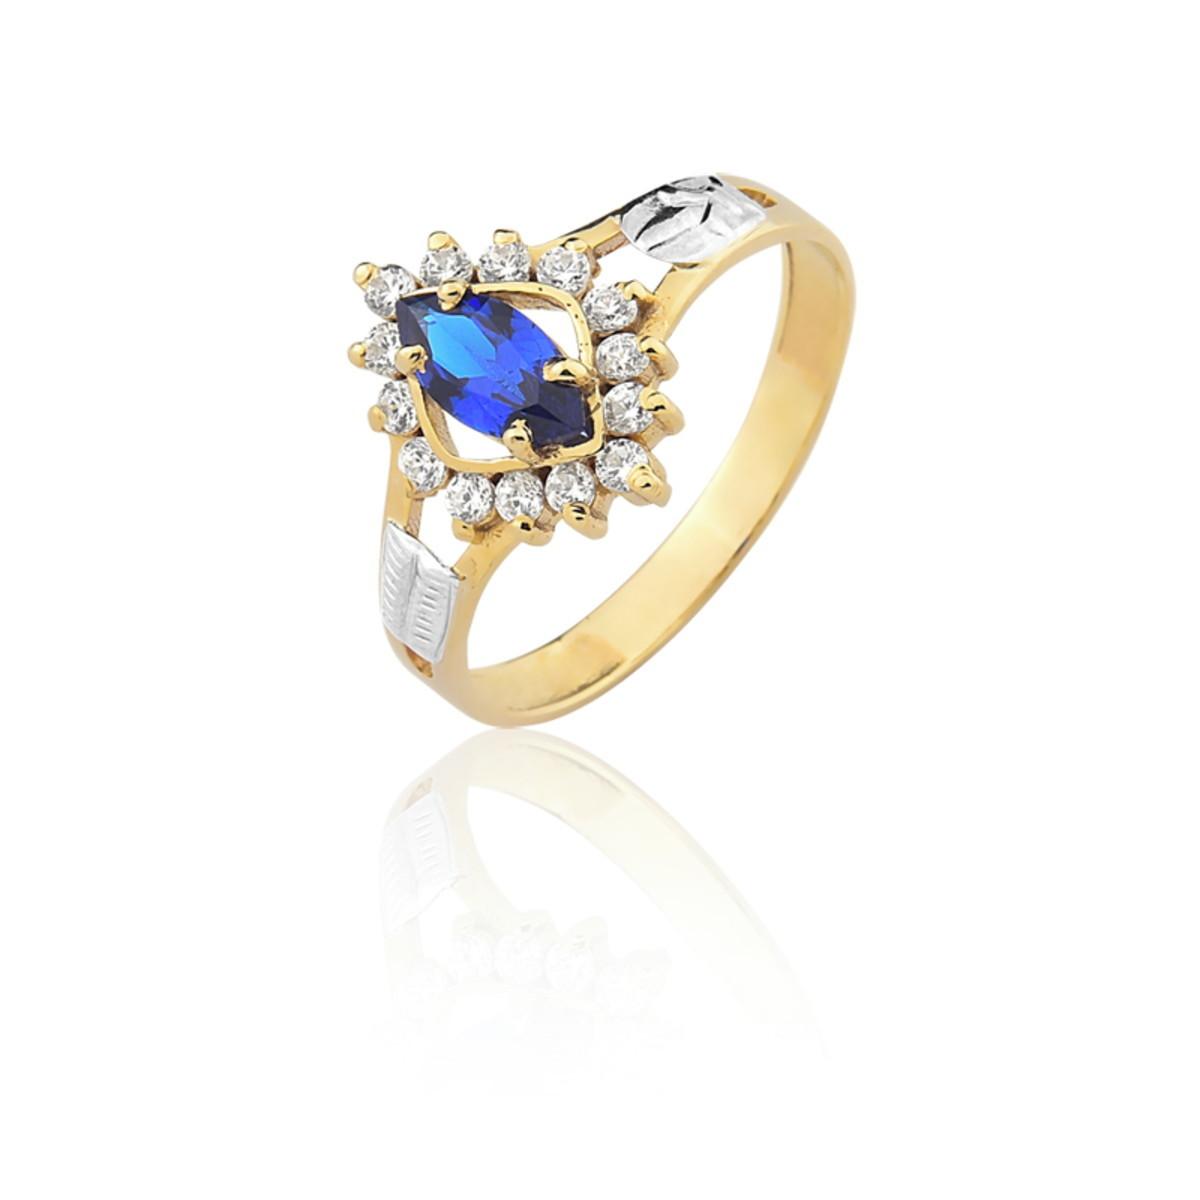 71c7db6643ff6 anel de formatura ouro 18k AN132 no Elo7   SUBLIME JOIAS (DAE741)